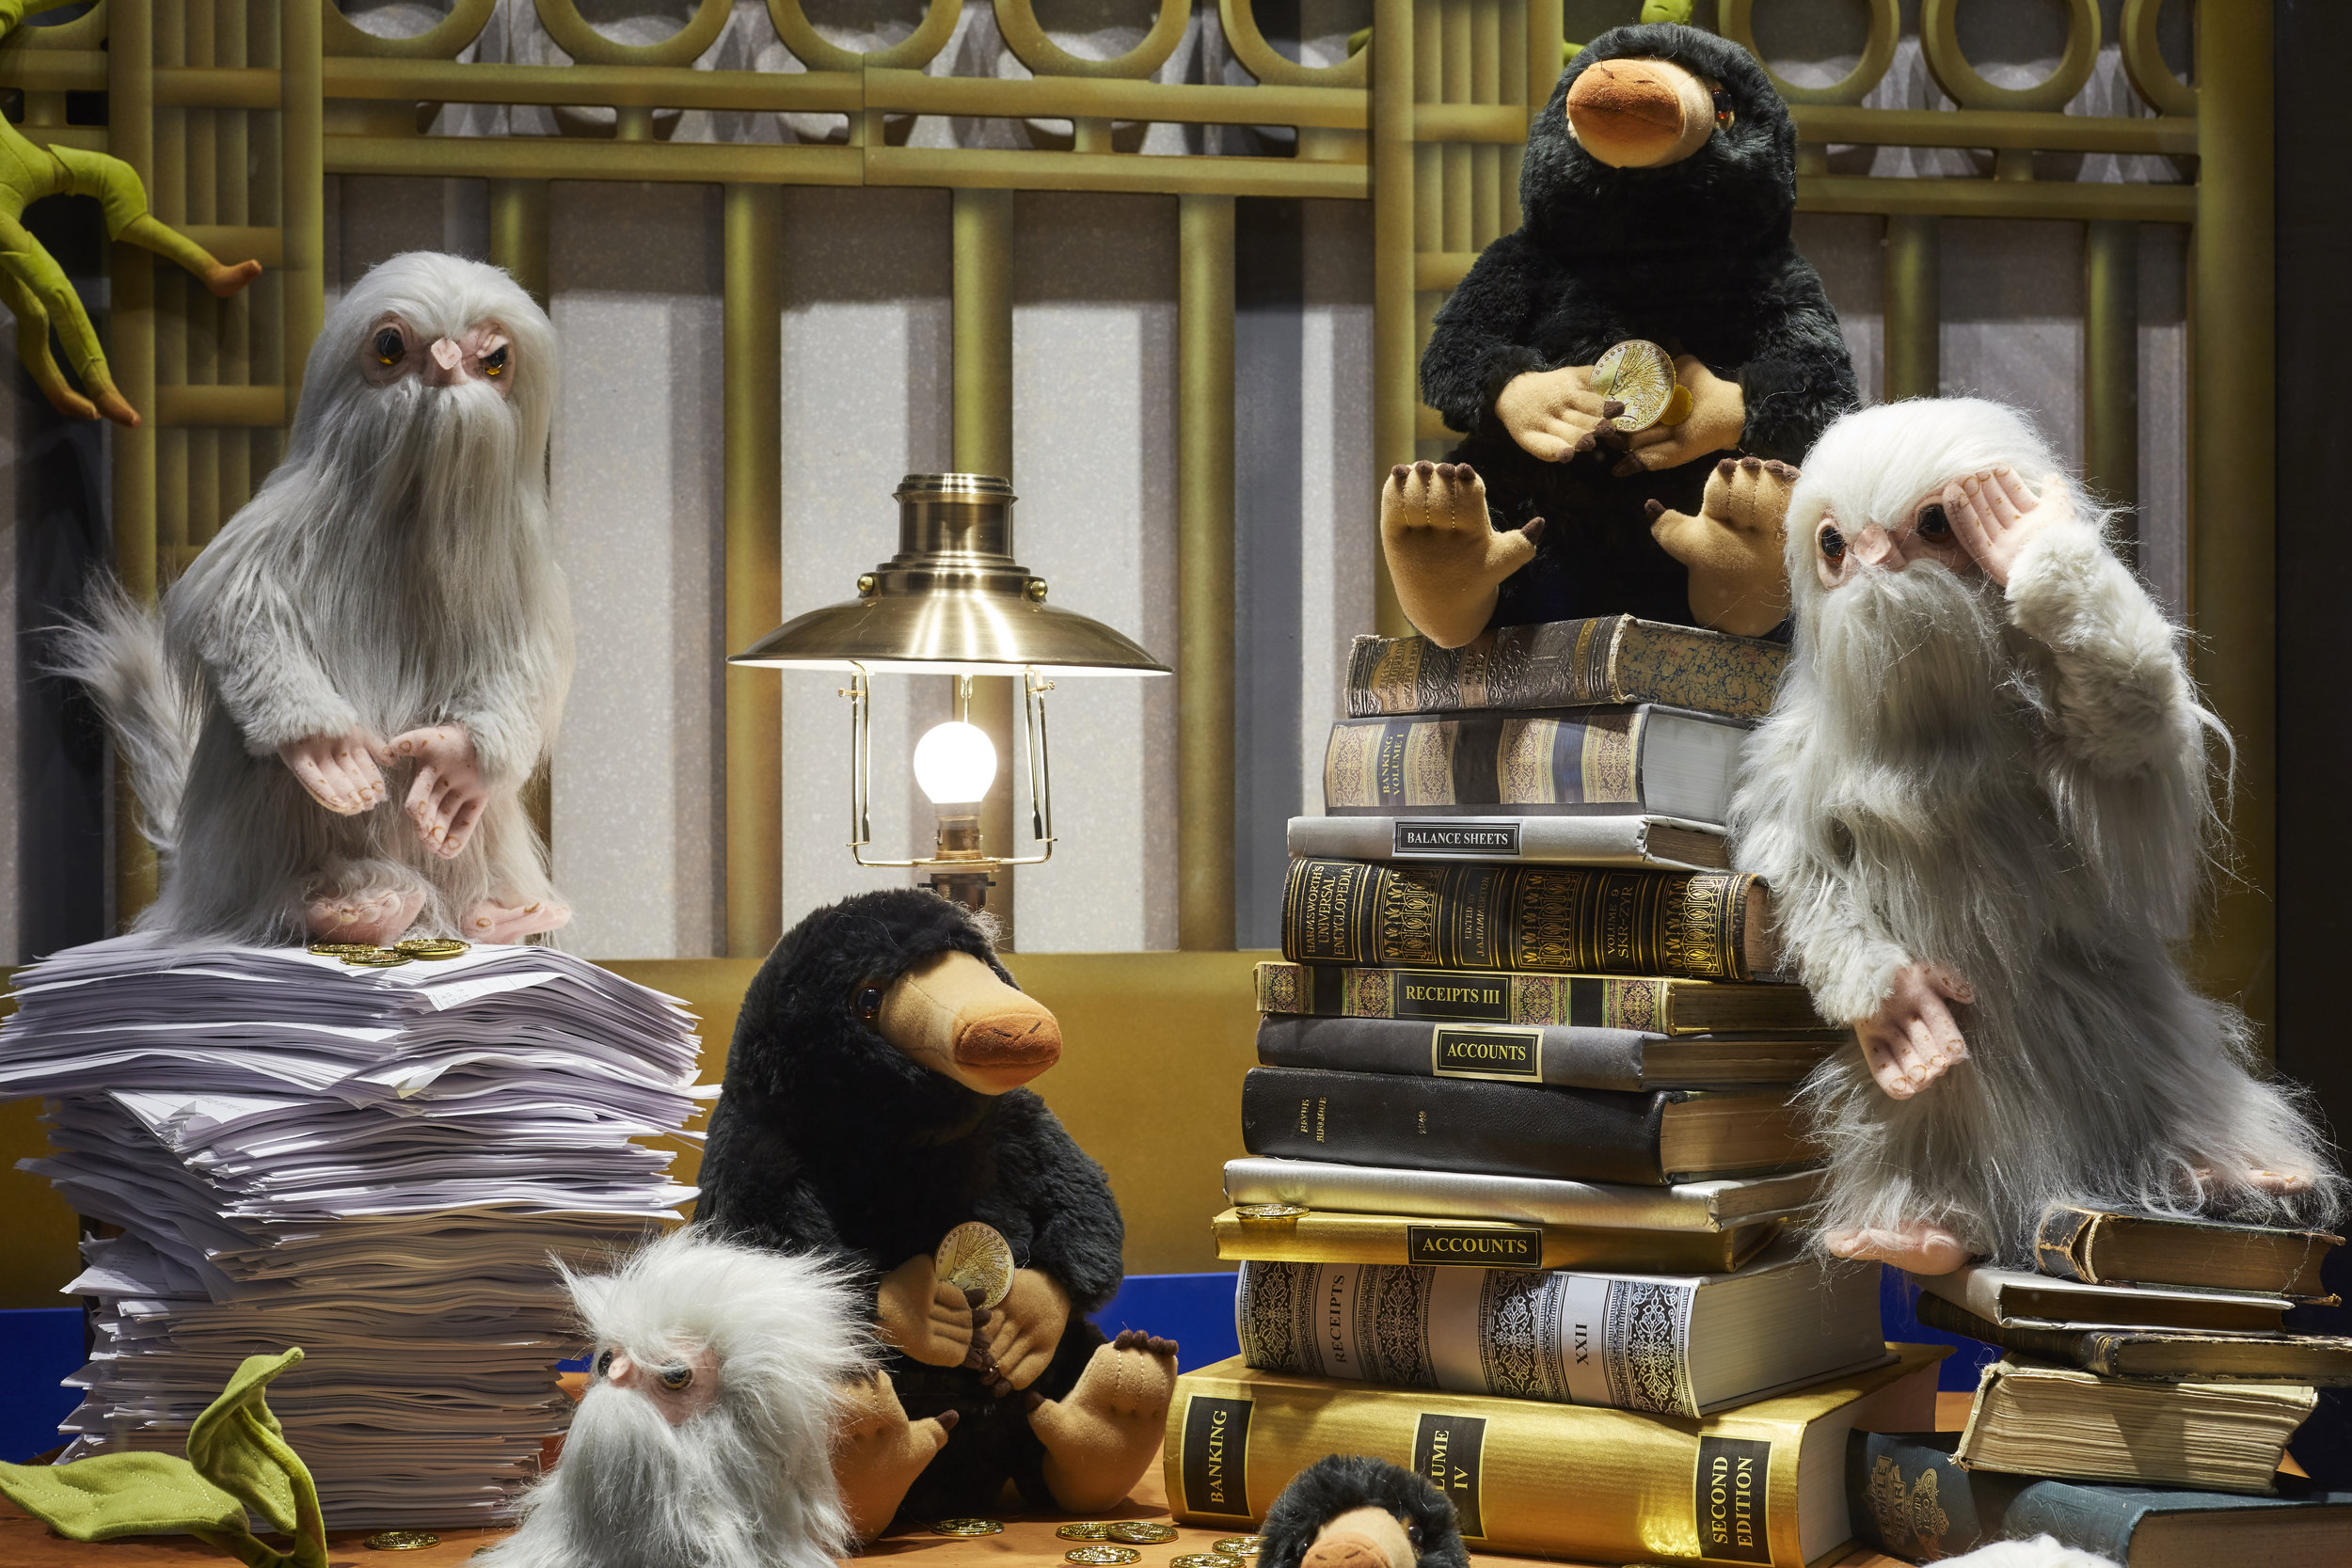 Propability, Props, Books, Lamp & Desk Fantastic Beasts Sourcing .jpg